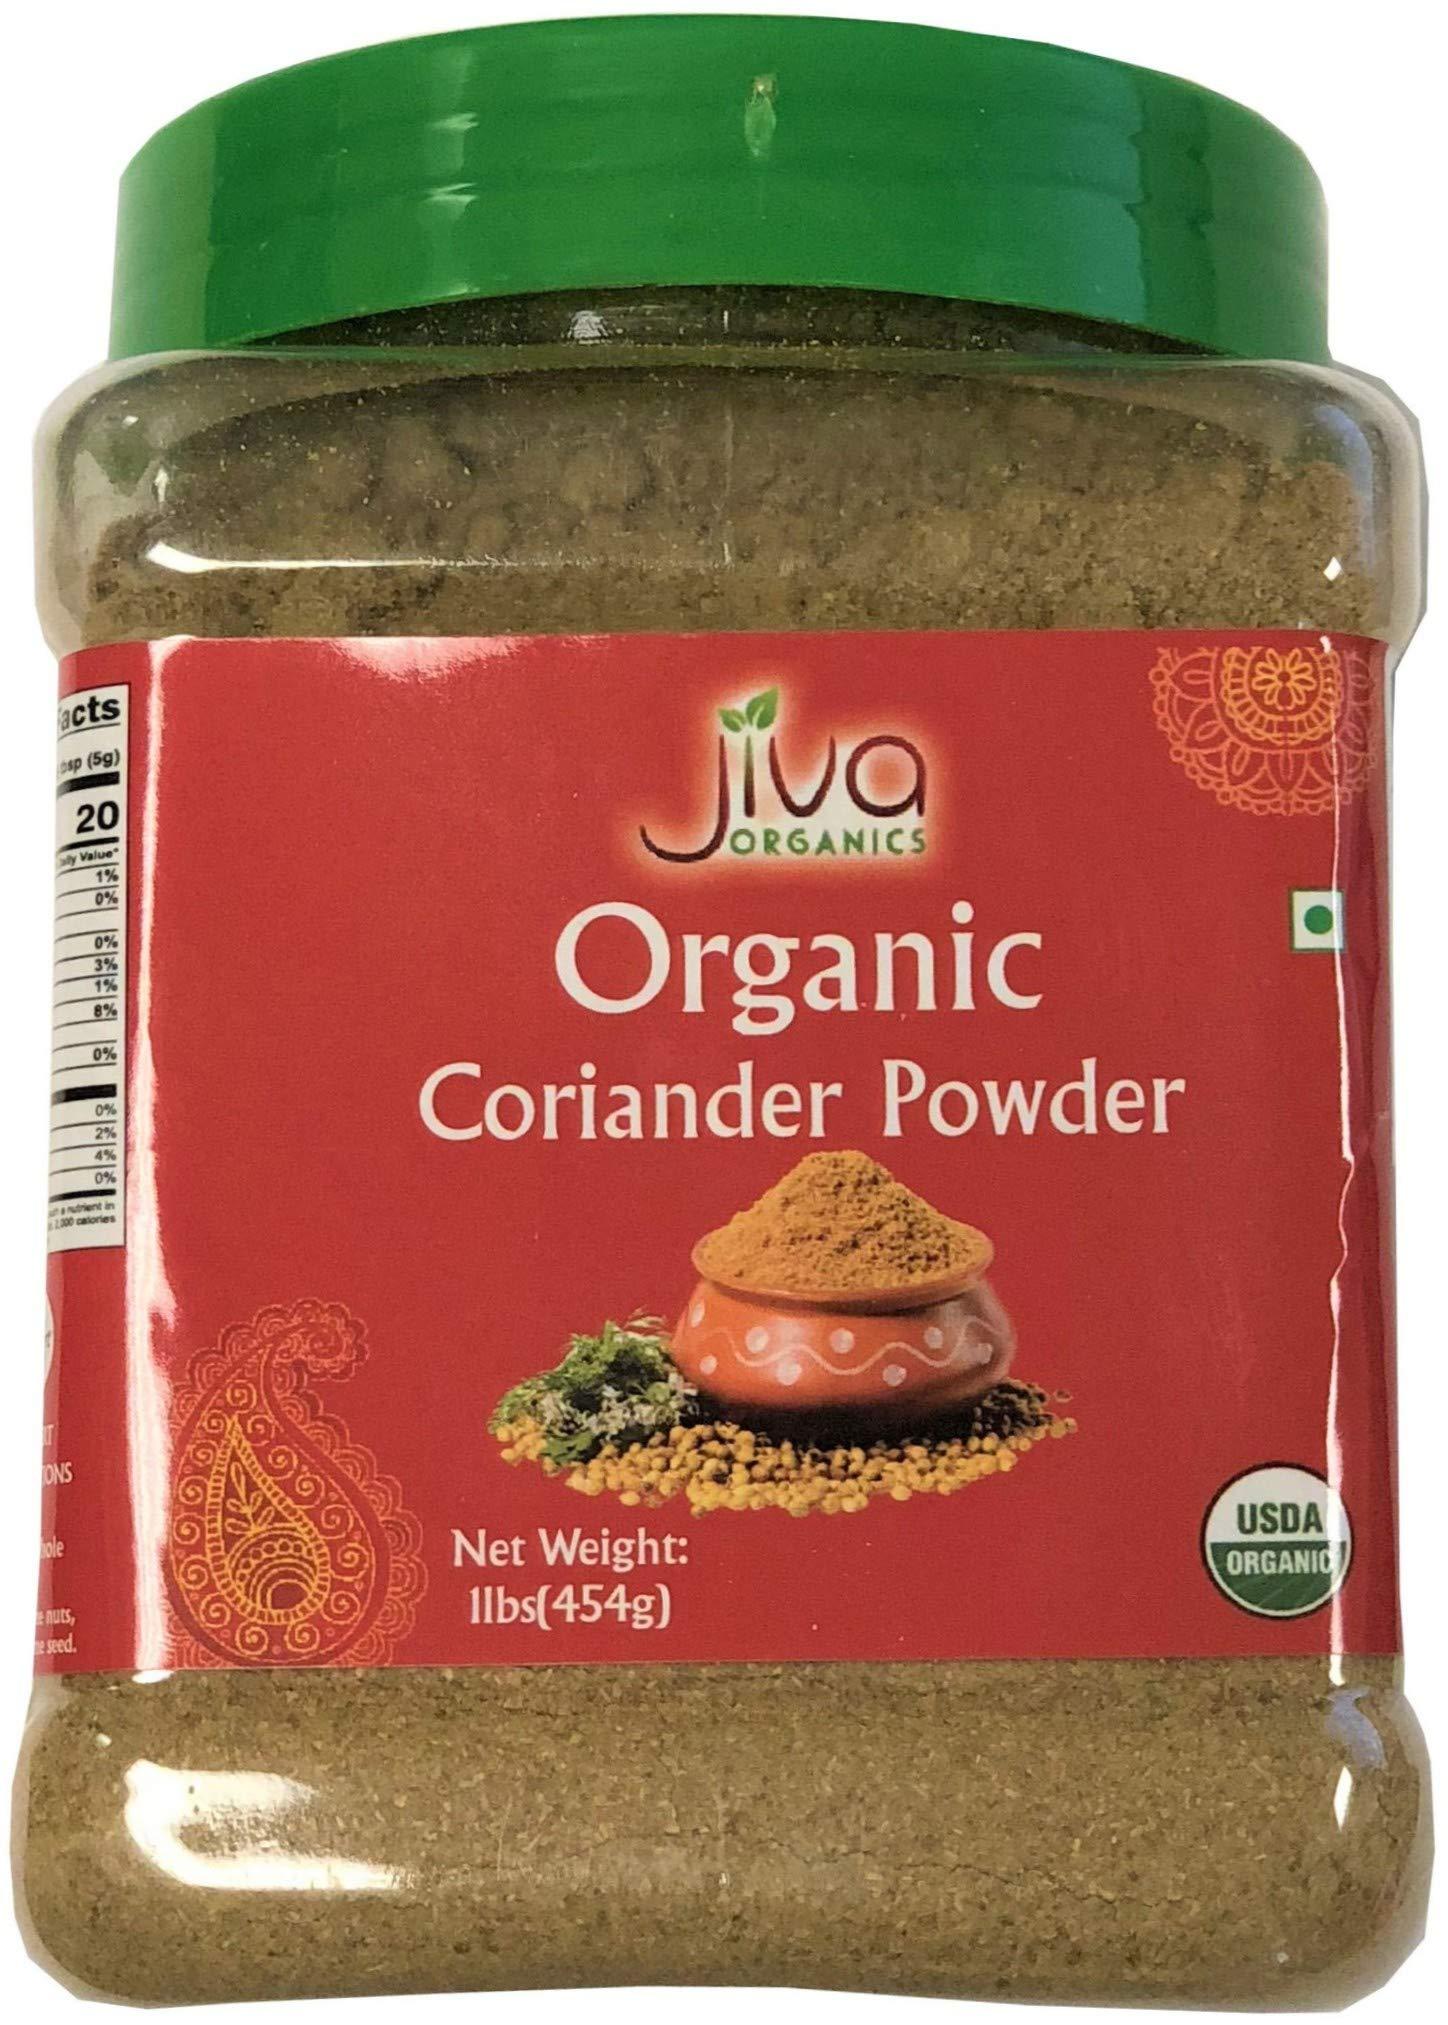 Jiva USDA Organic Coriander Powder 1LB (16oz) - Packaged in Resealable Jar